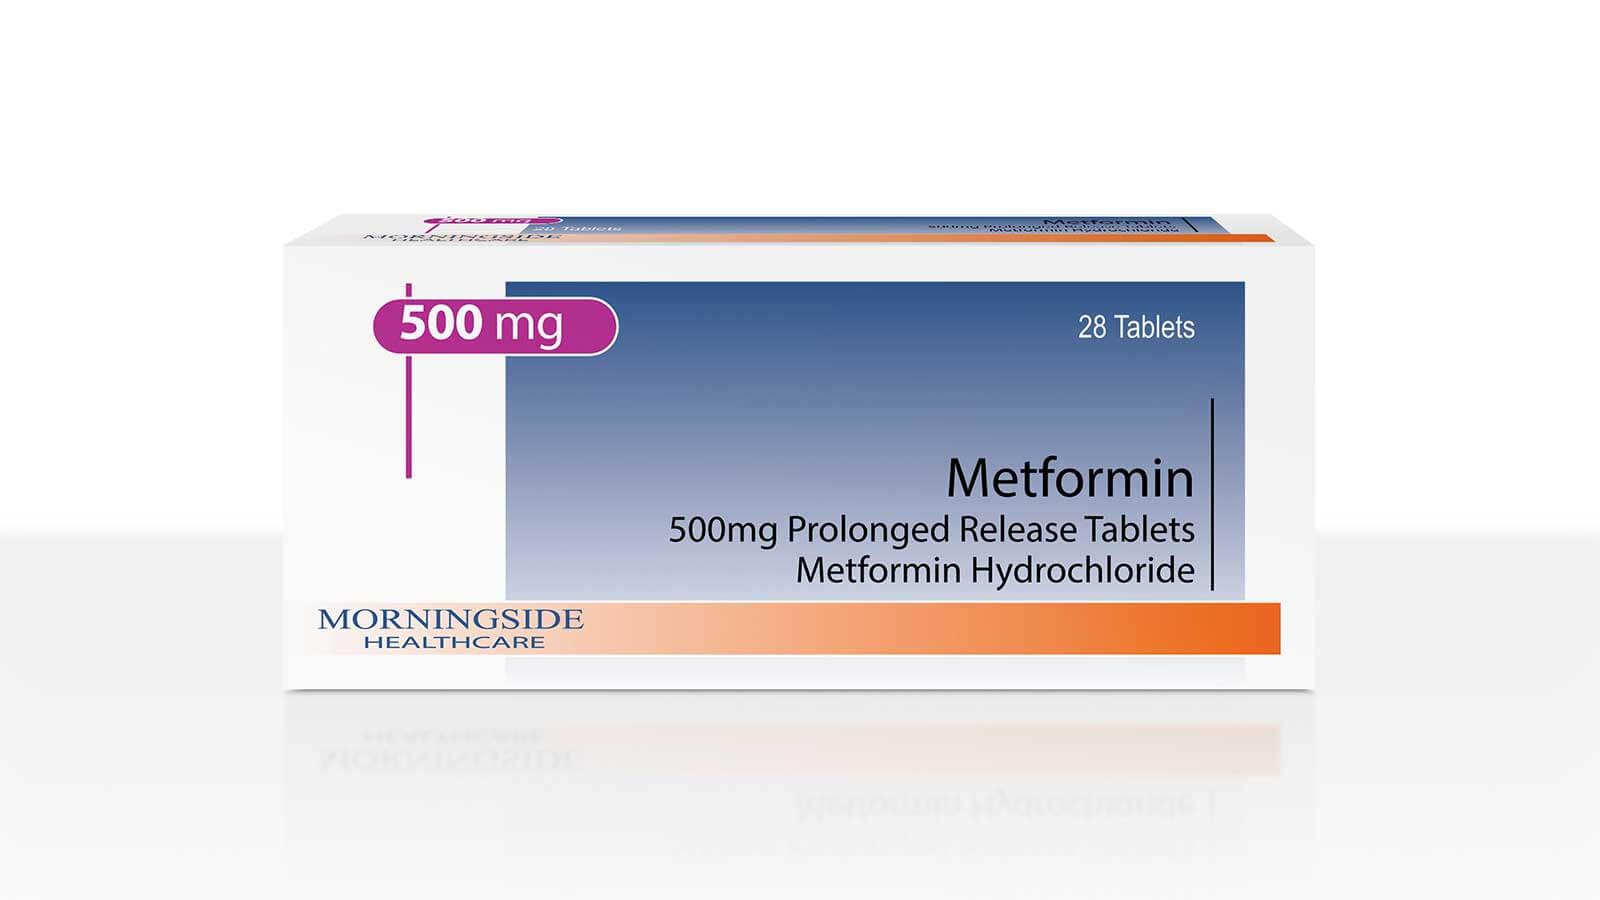 Metformin PR Tablets